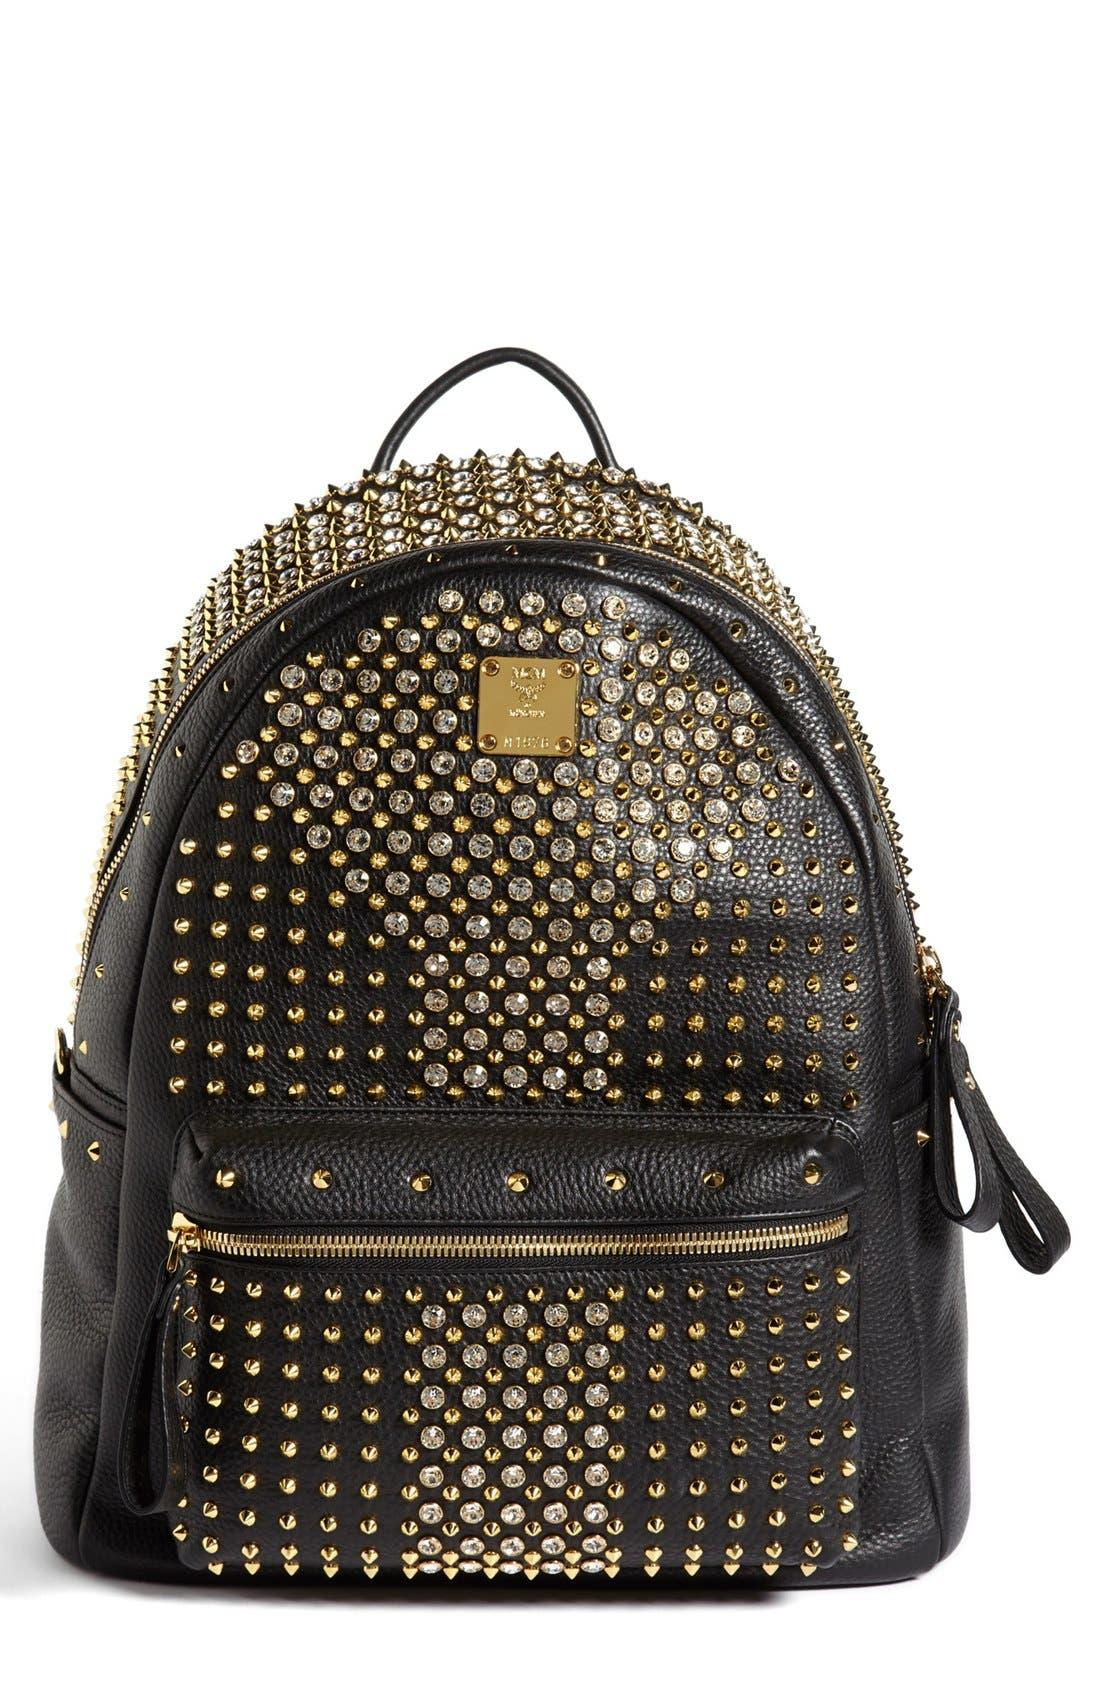 Main Image - MCM 'Crystal Studded - Medium' Leather Backpack